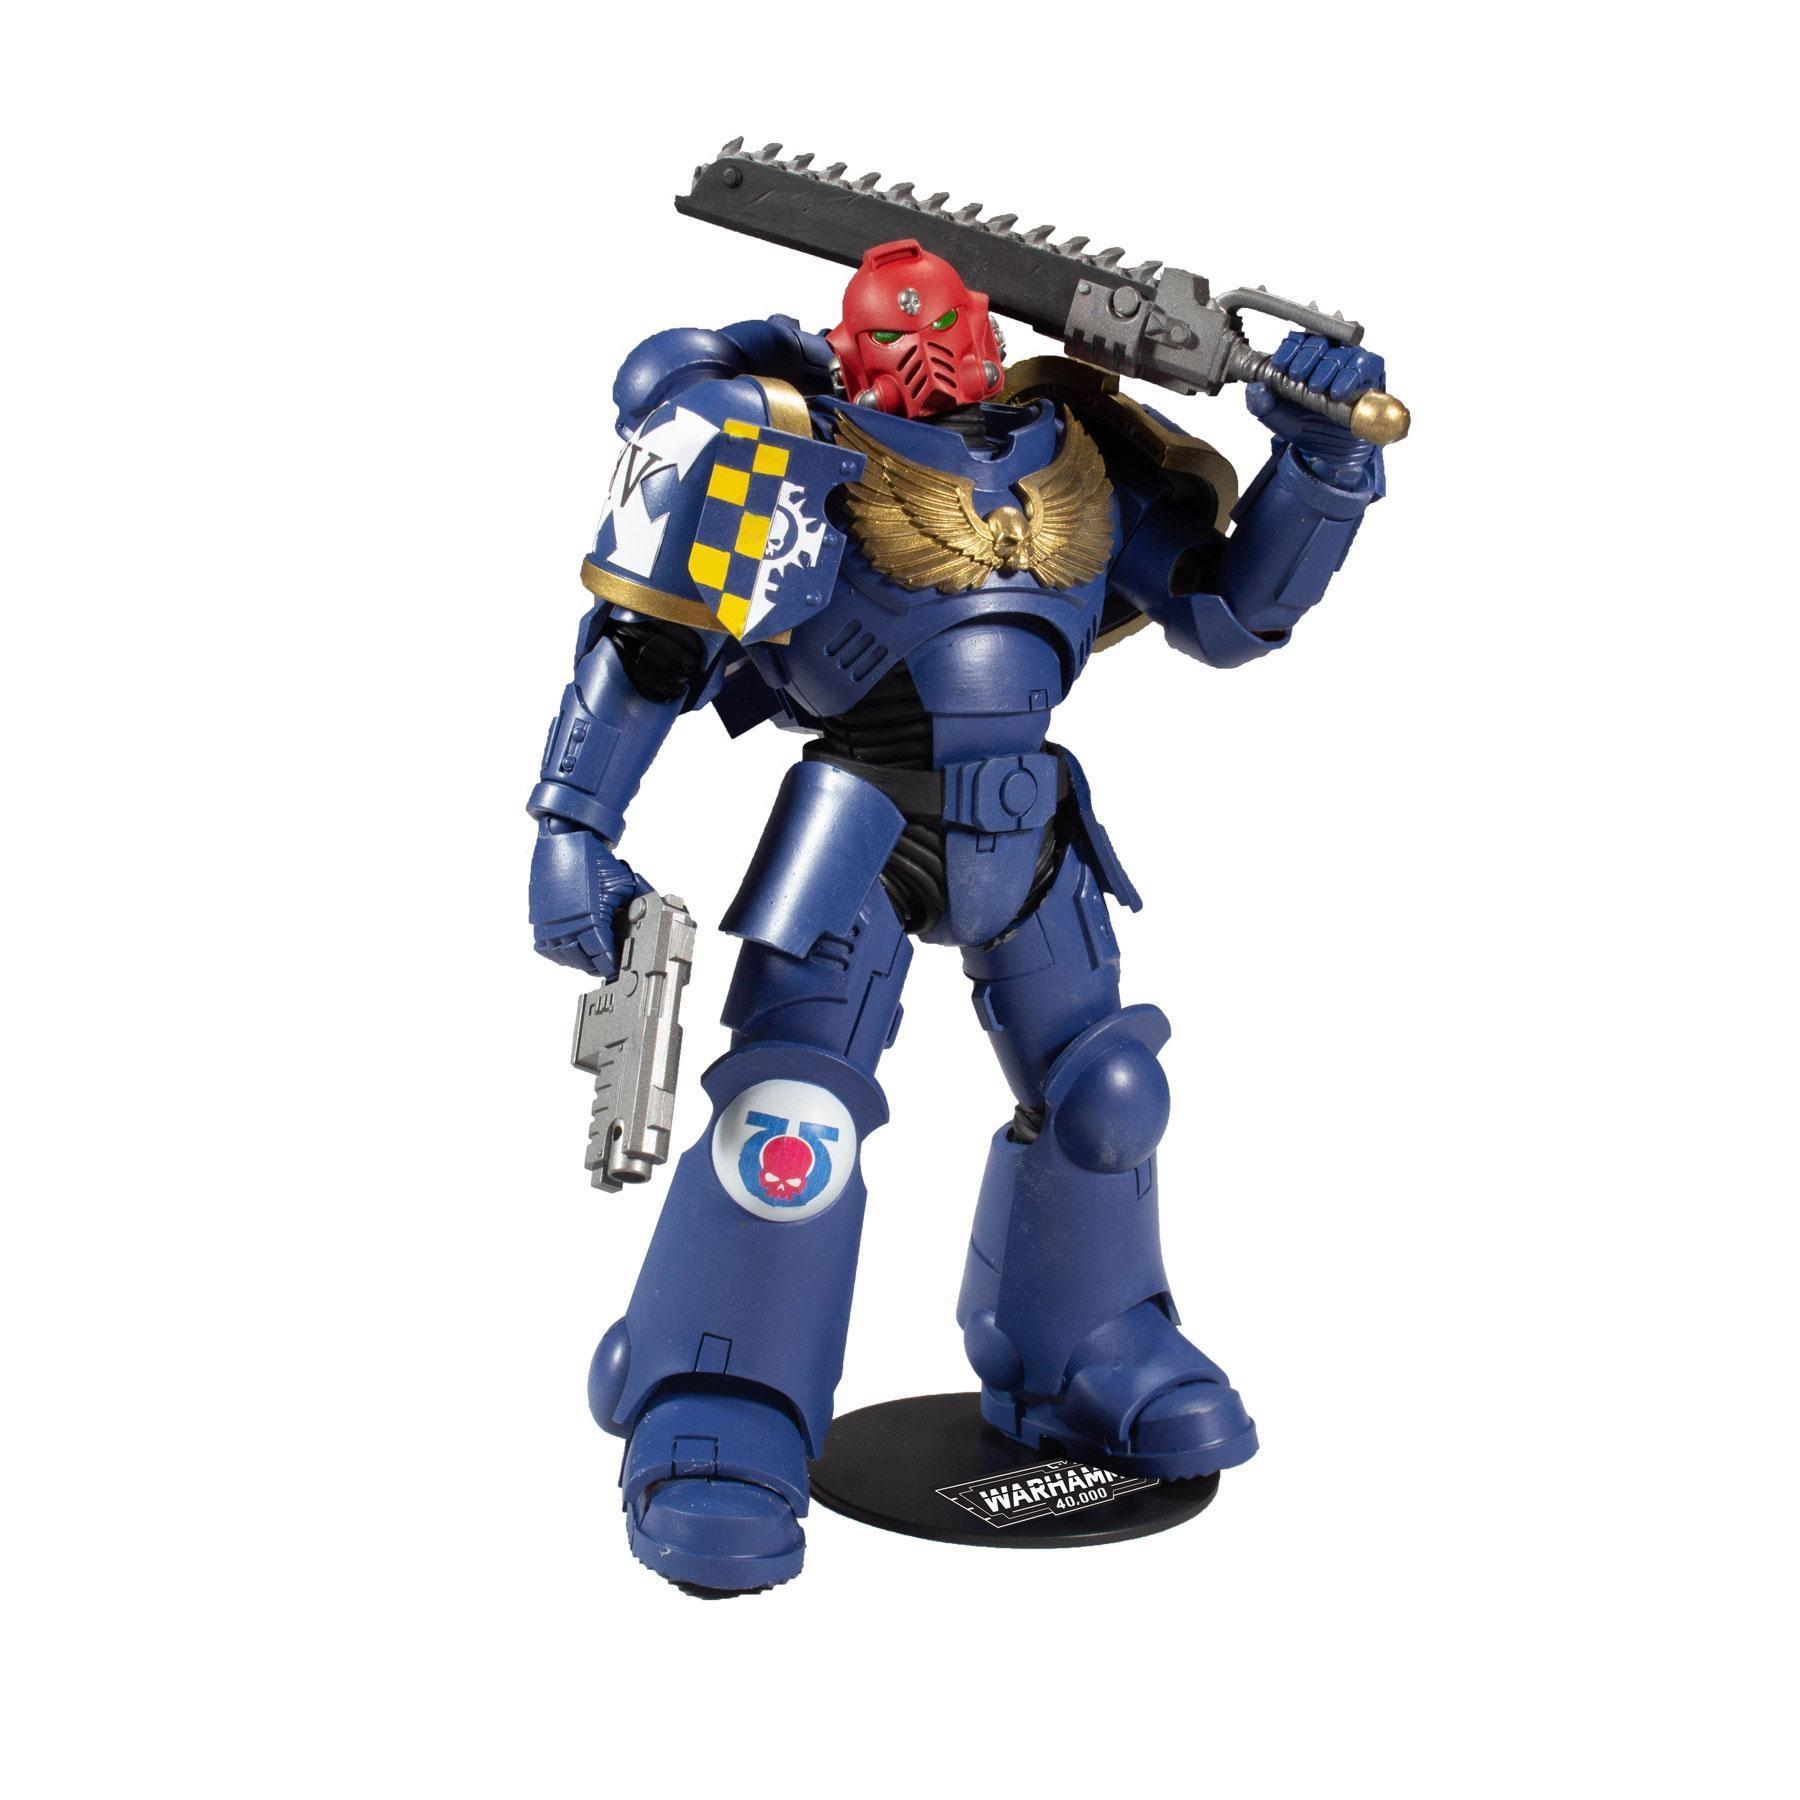 Suukoo toys figurine warhammer marine space 2